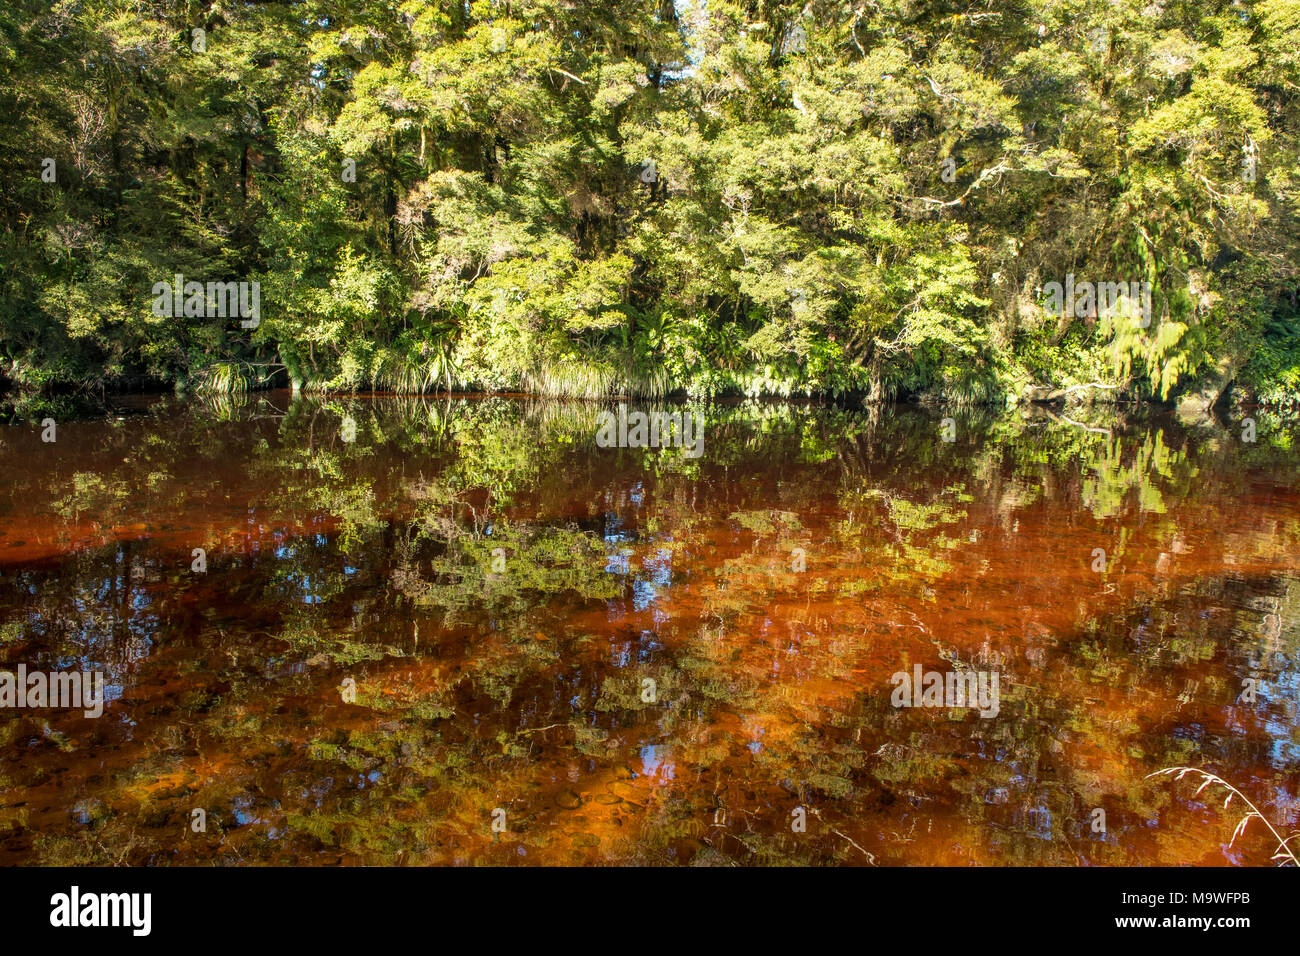 Tannin in Oparara River, Kahurangi National Park, South Island, New Zealand Stock Photo